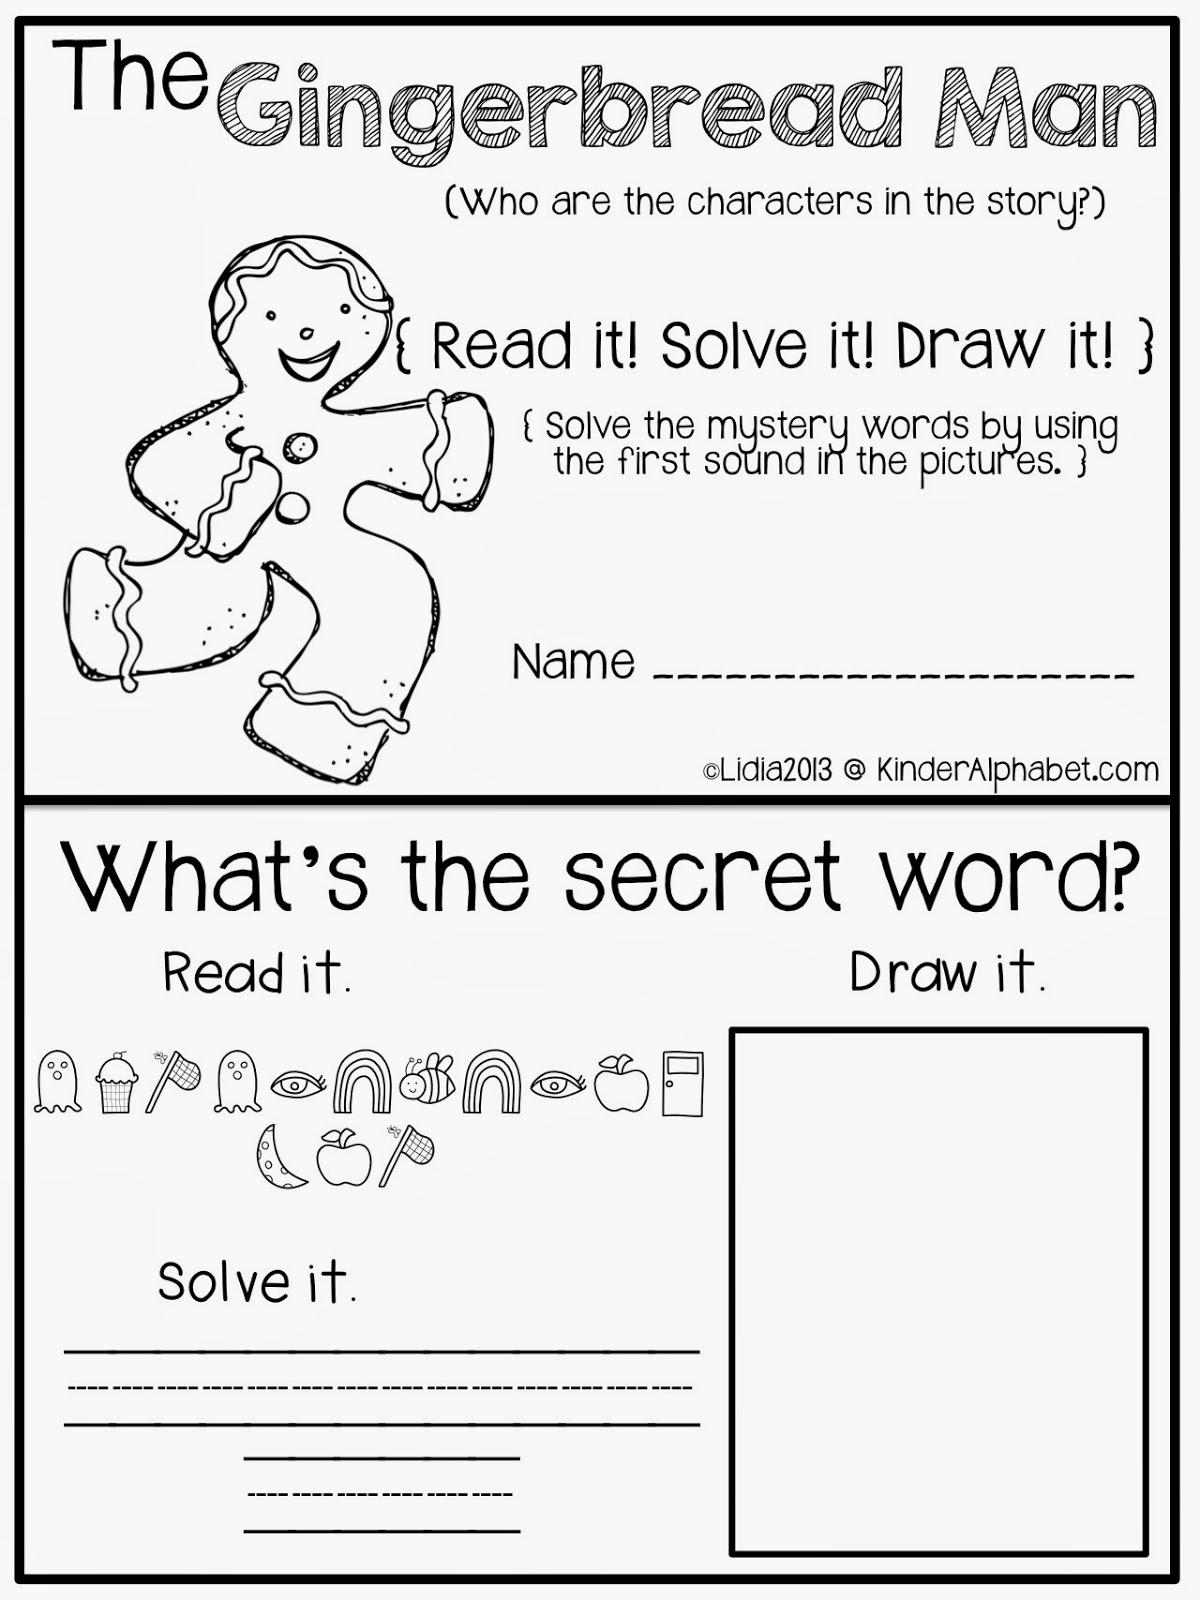 Read It! Draw It! Solve It! Problem Solving for Intermediate Grades, Grades 4-5